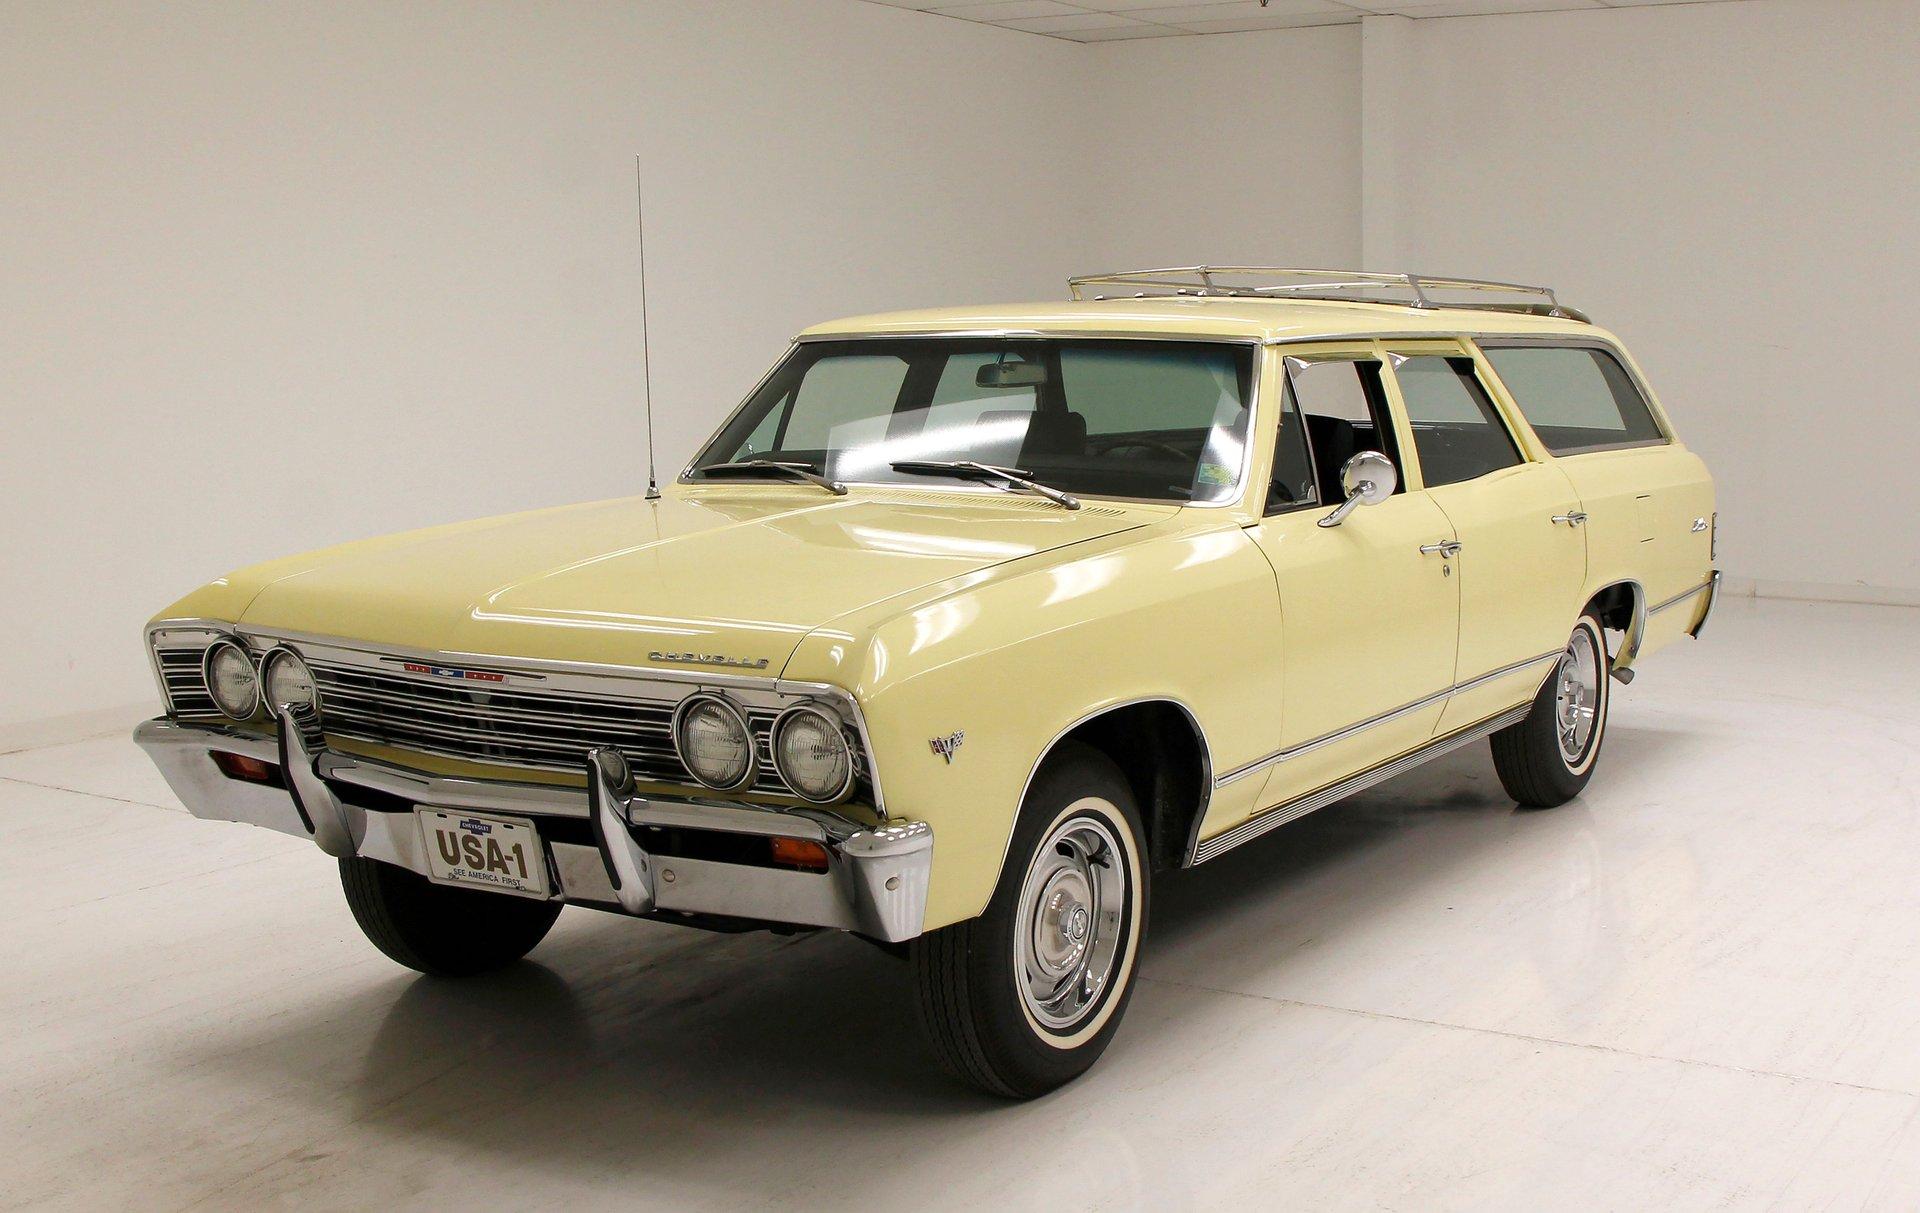 1967 Chevrolet Chevelle Malibu Station Wagon